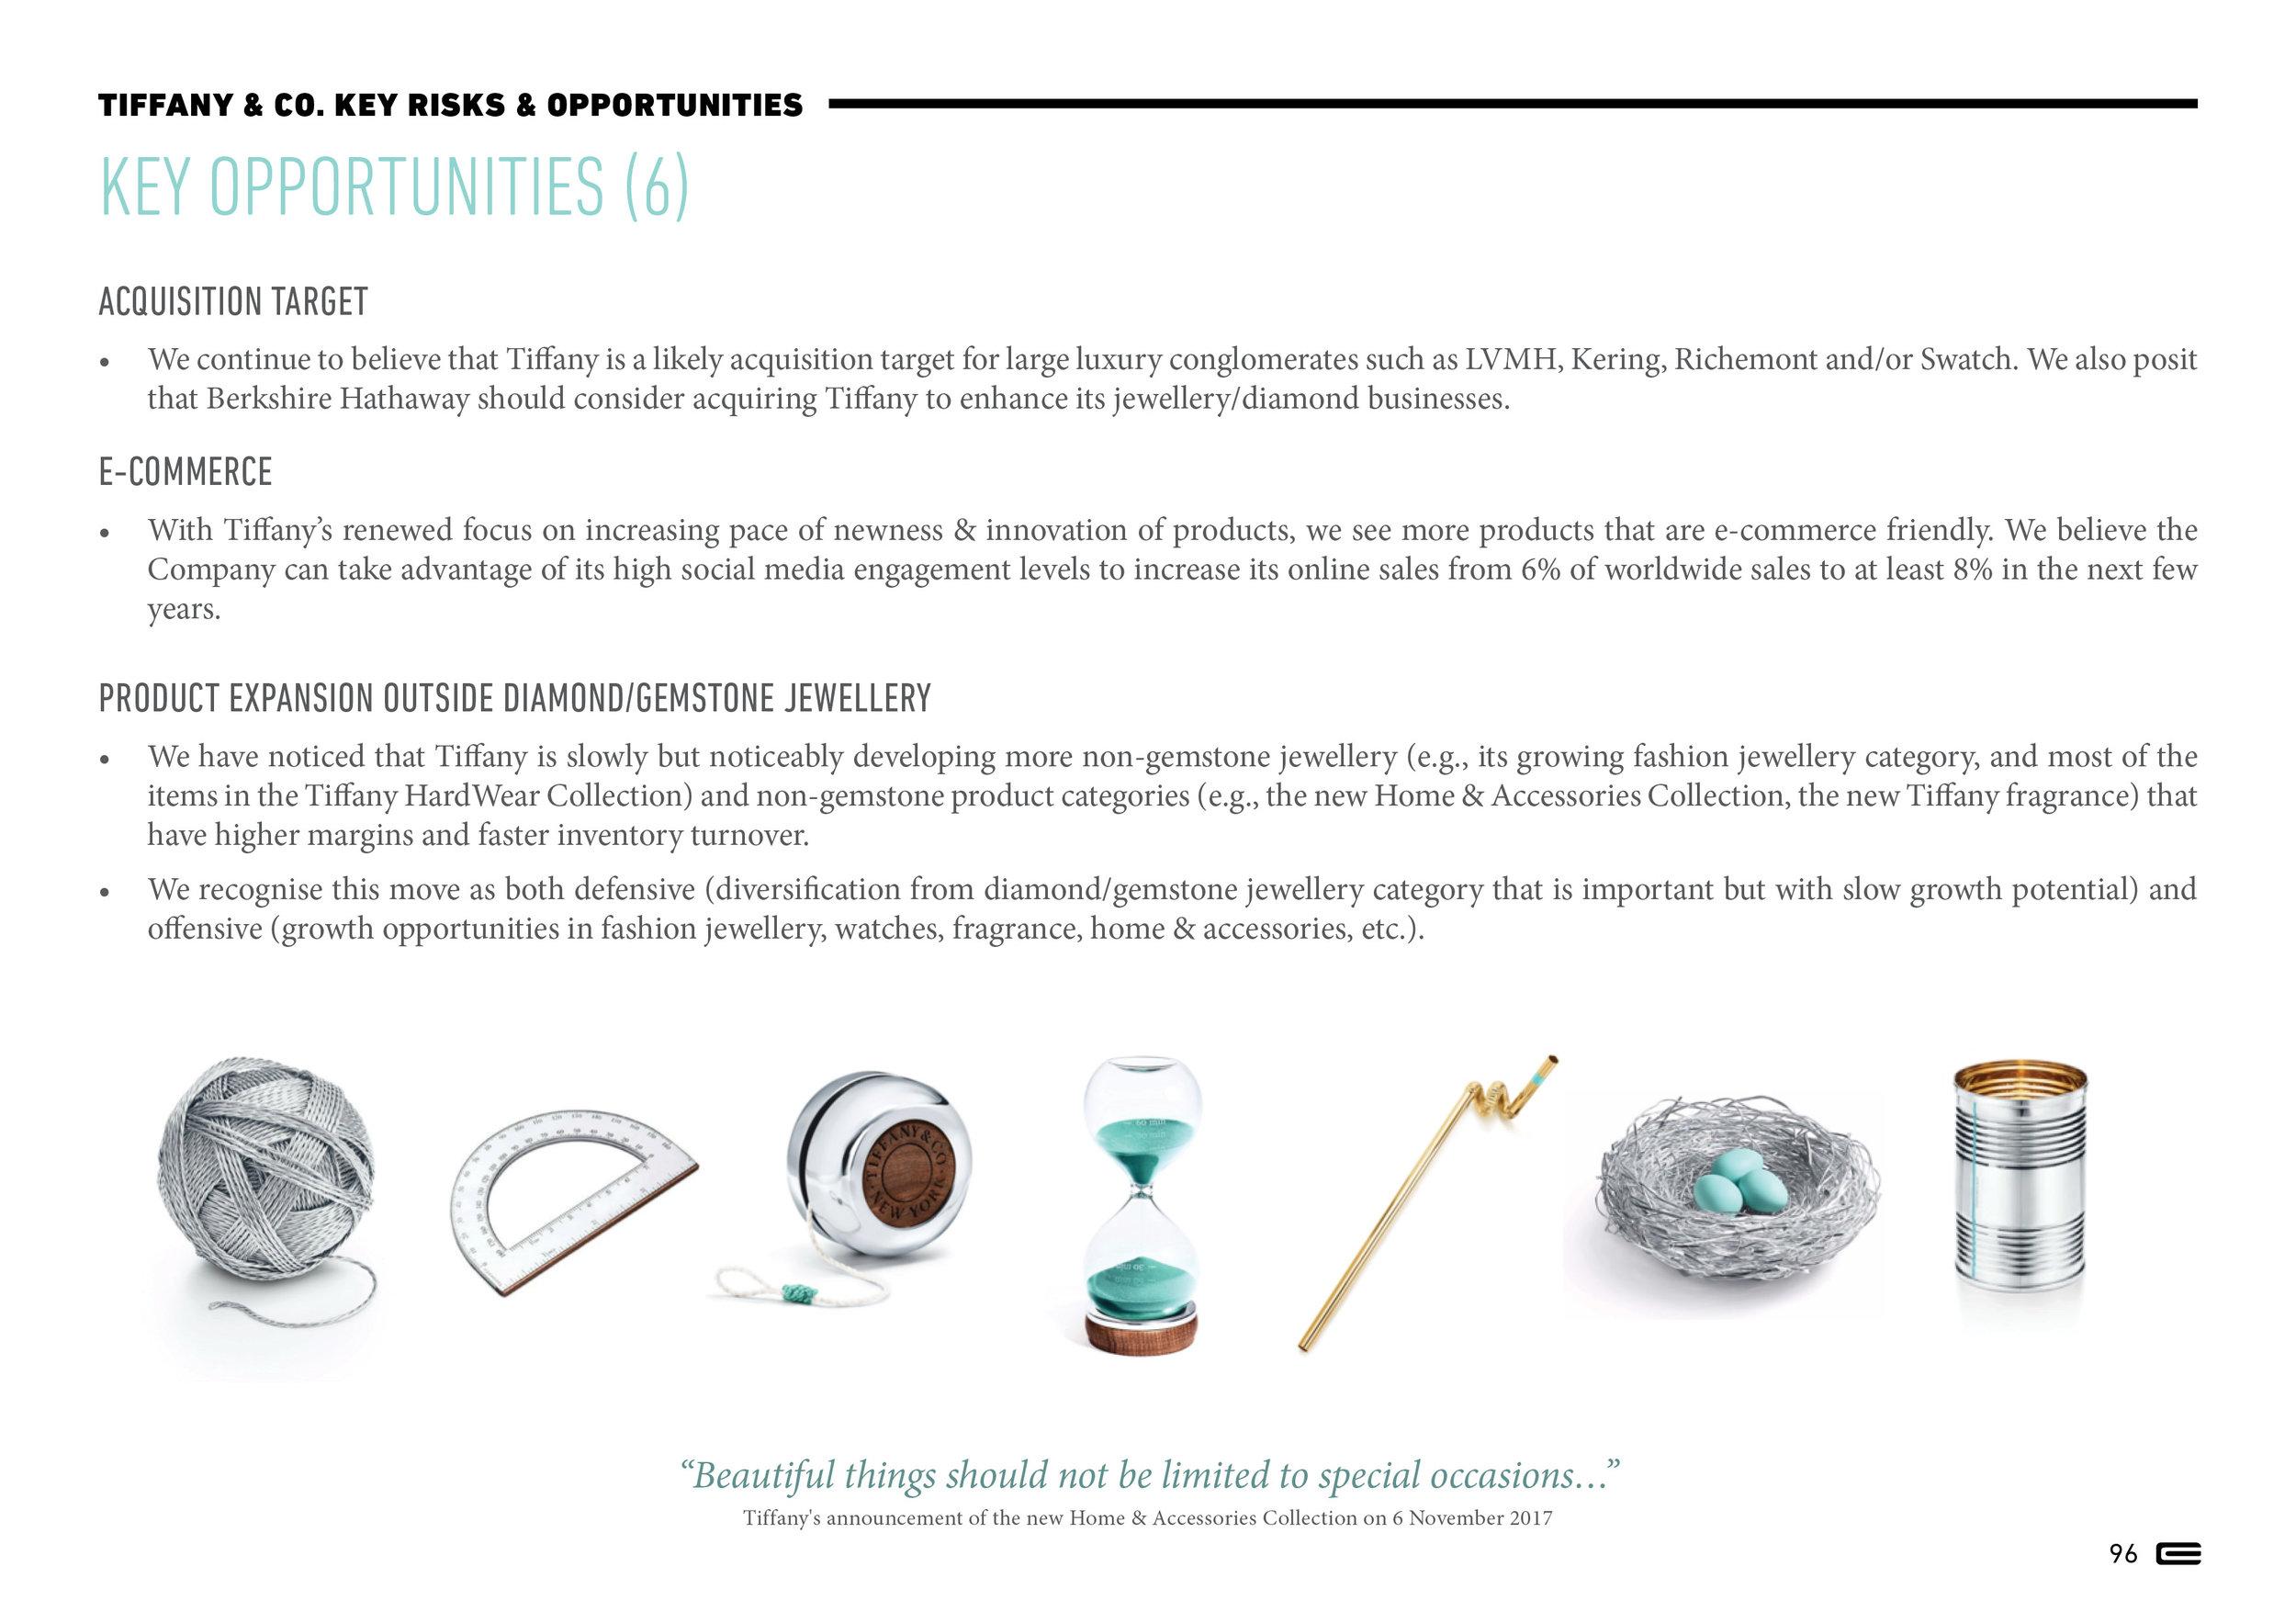 EC - VIC 2018 Presentation on Tiffany96.jpg